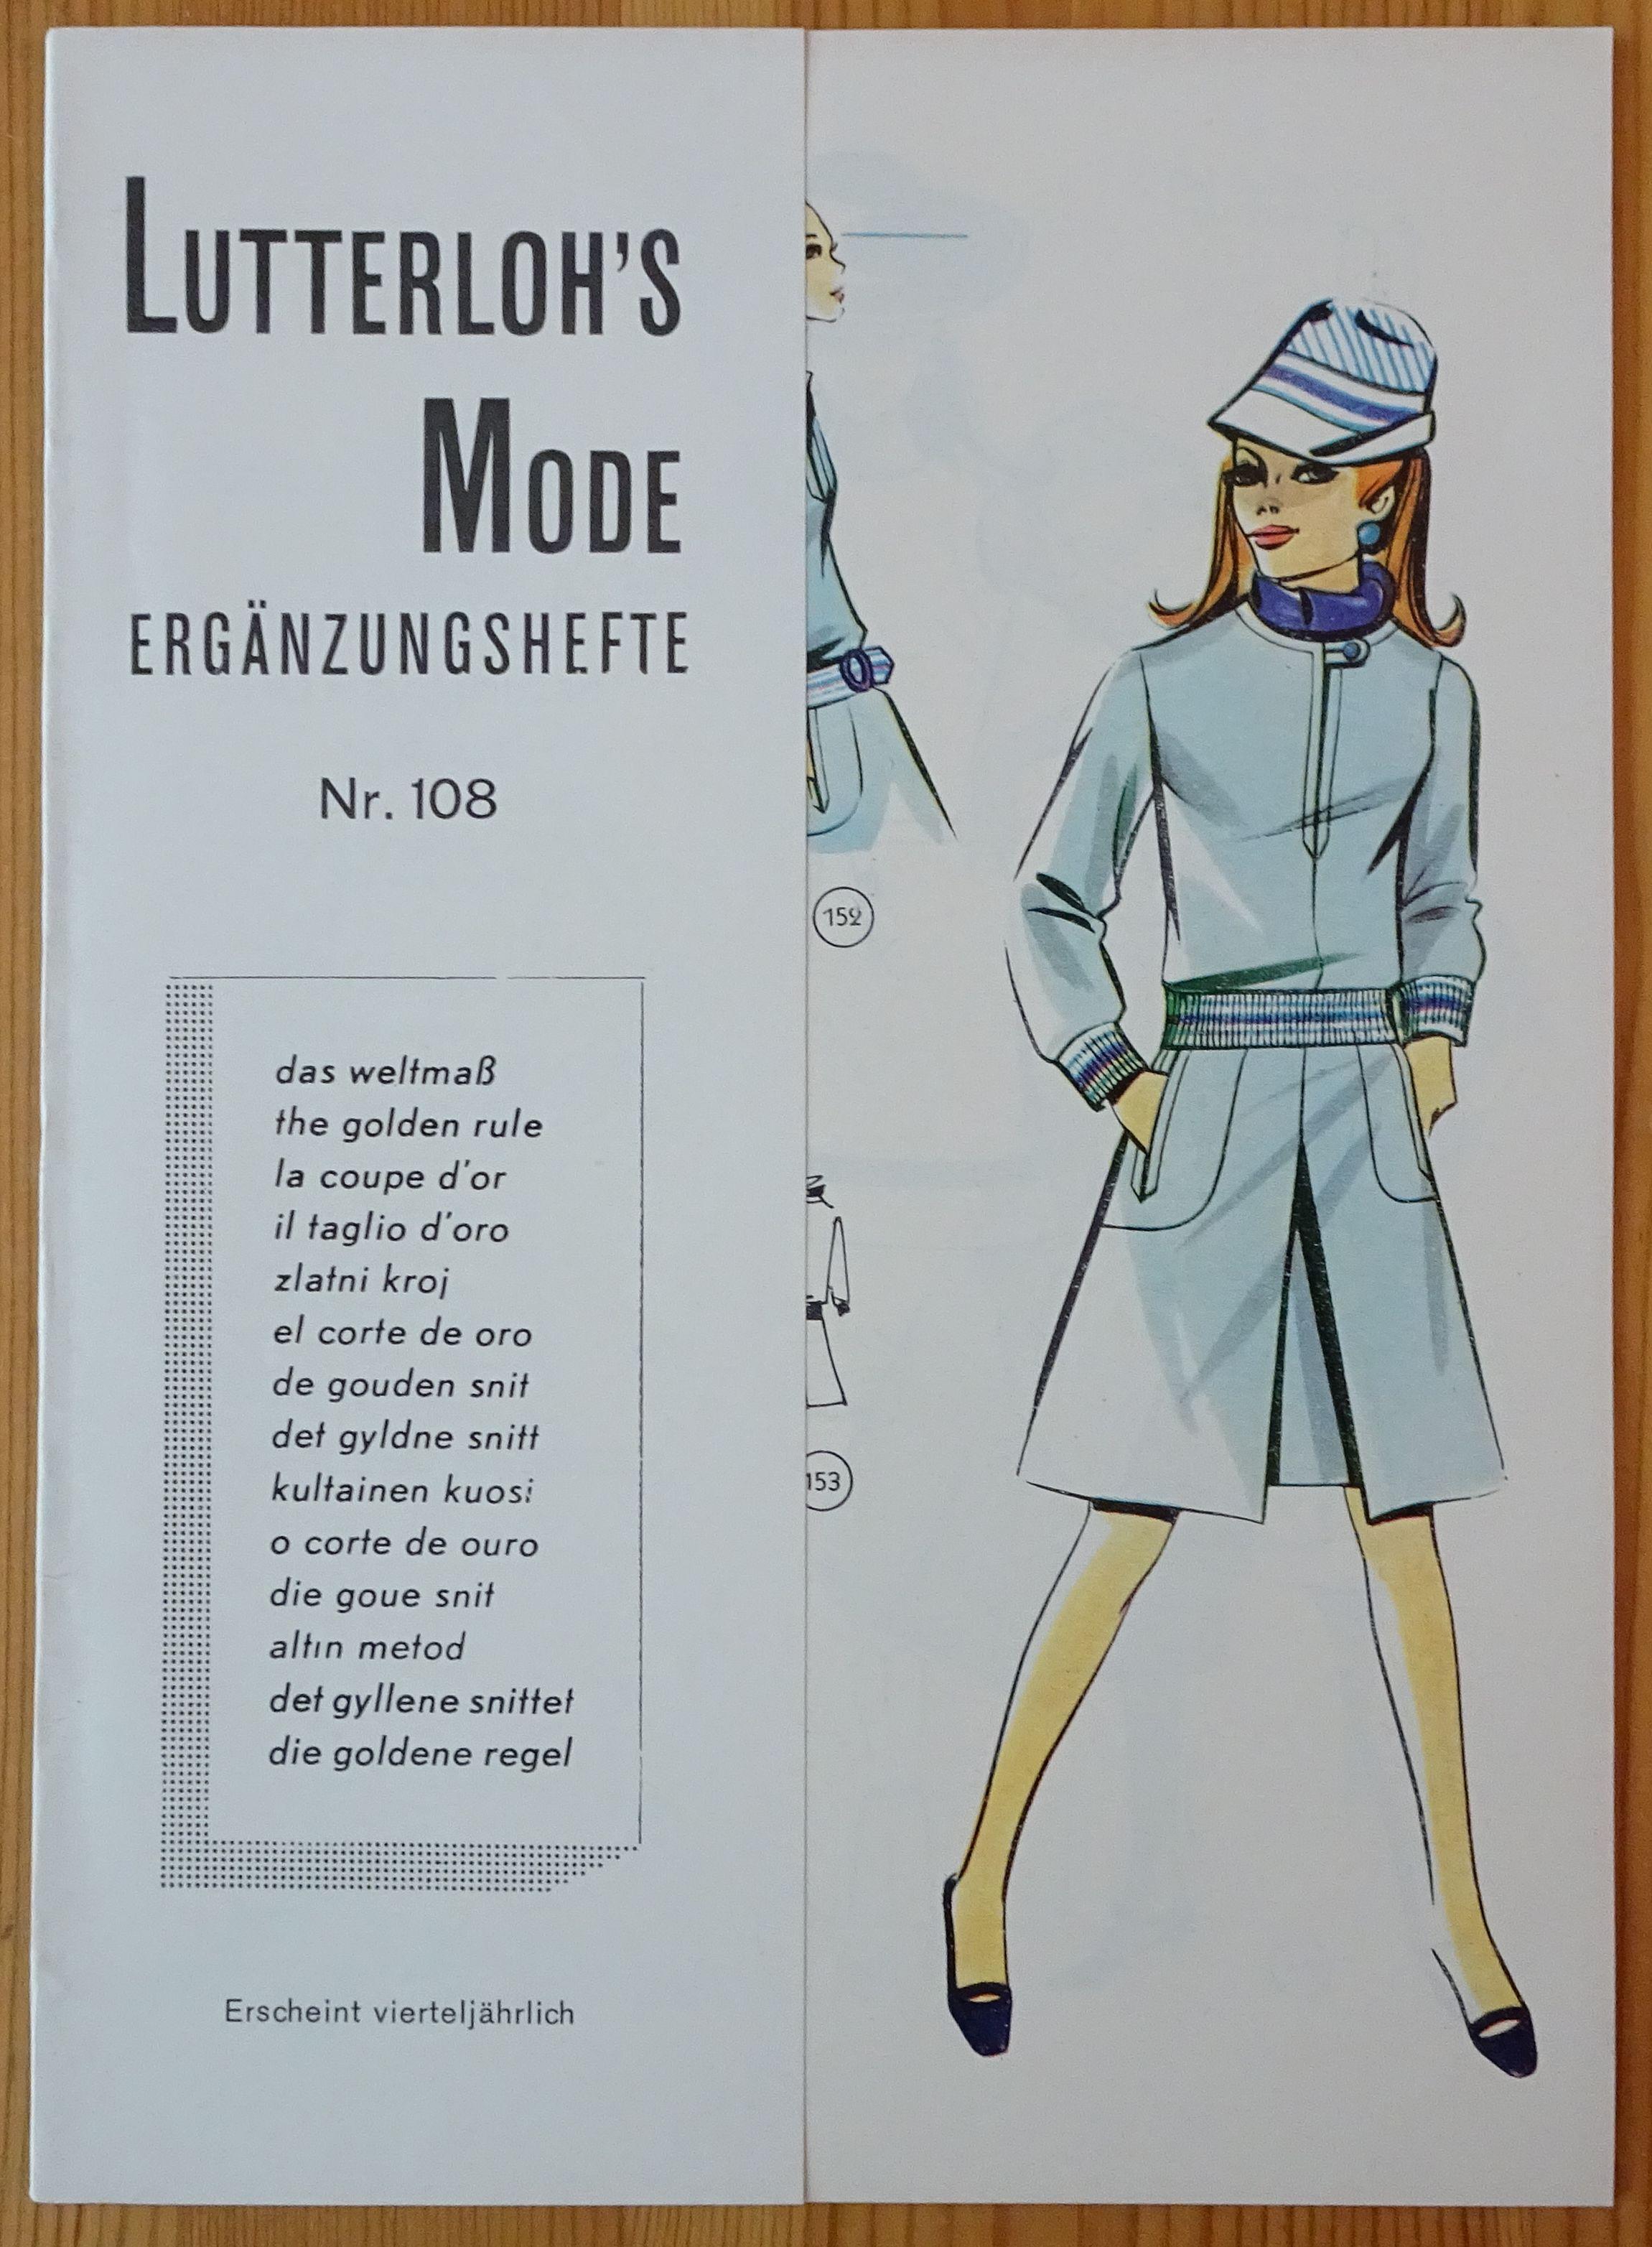 Lutterloh Supplement 108